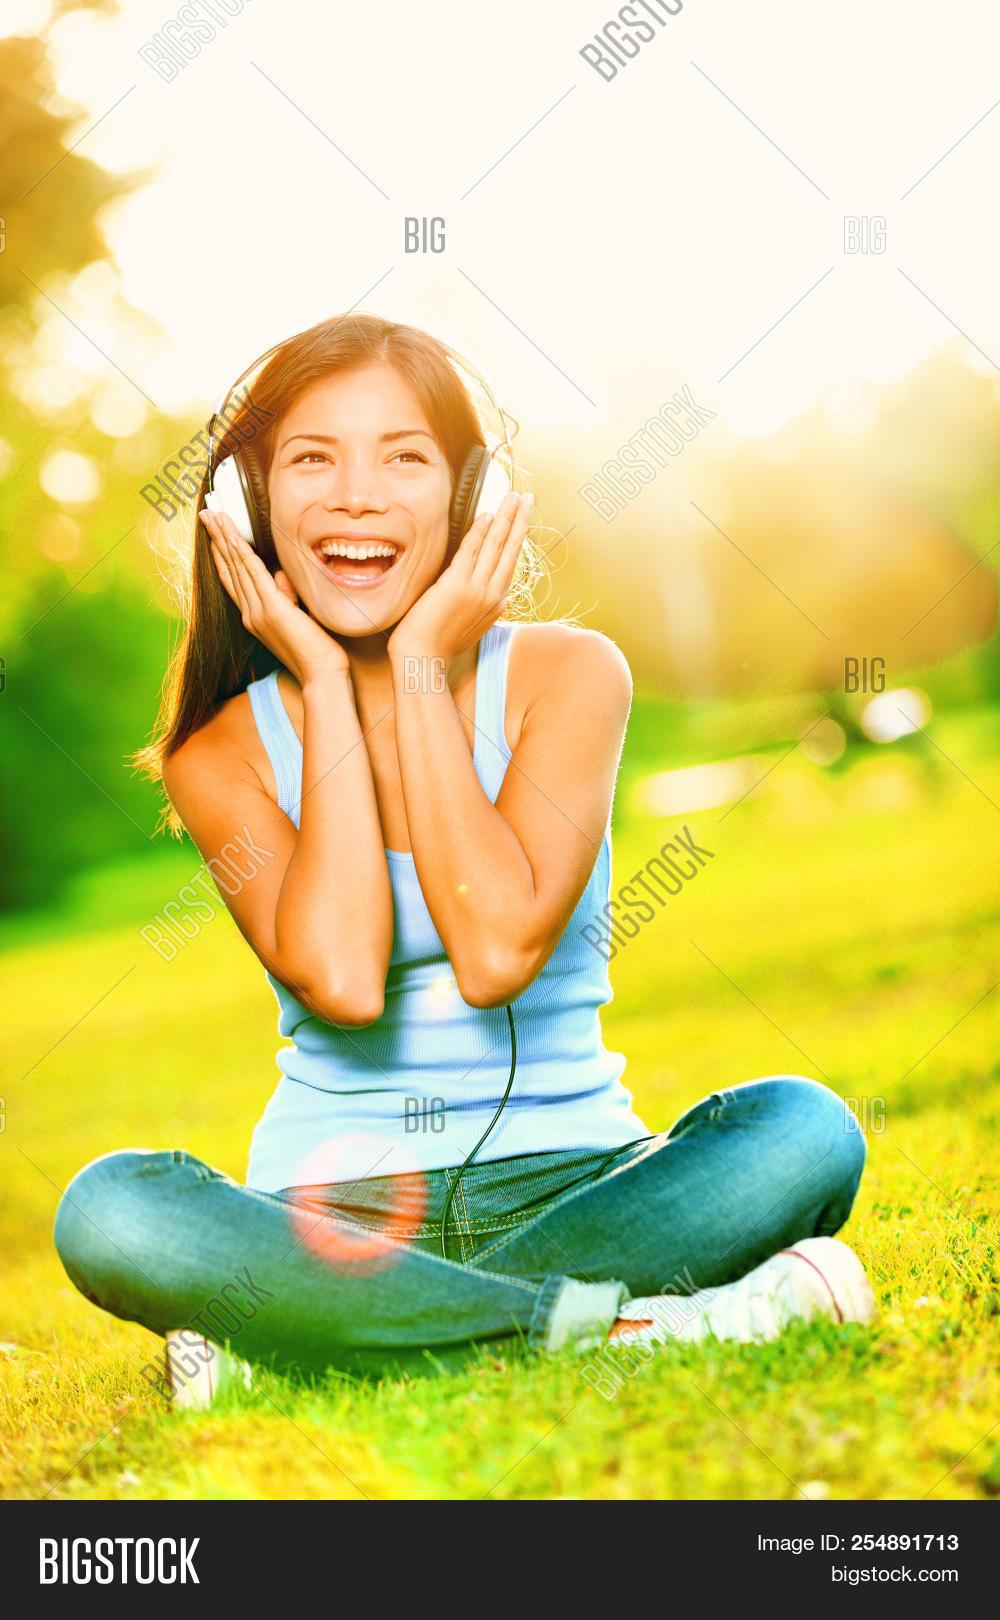 Music Headphones Woman Image & Photo (Free Trial) | Bigstock